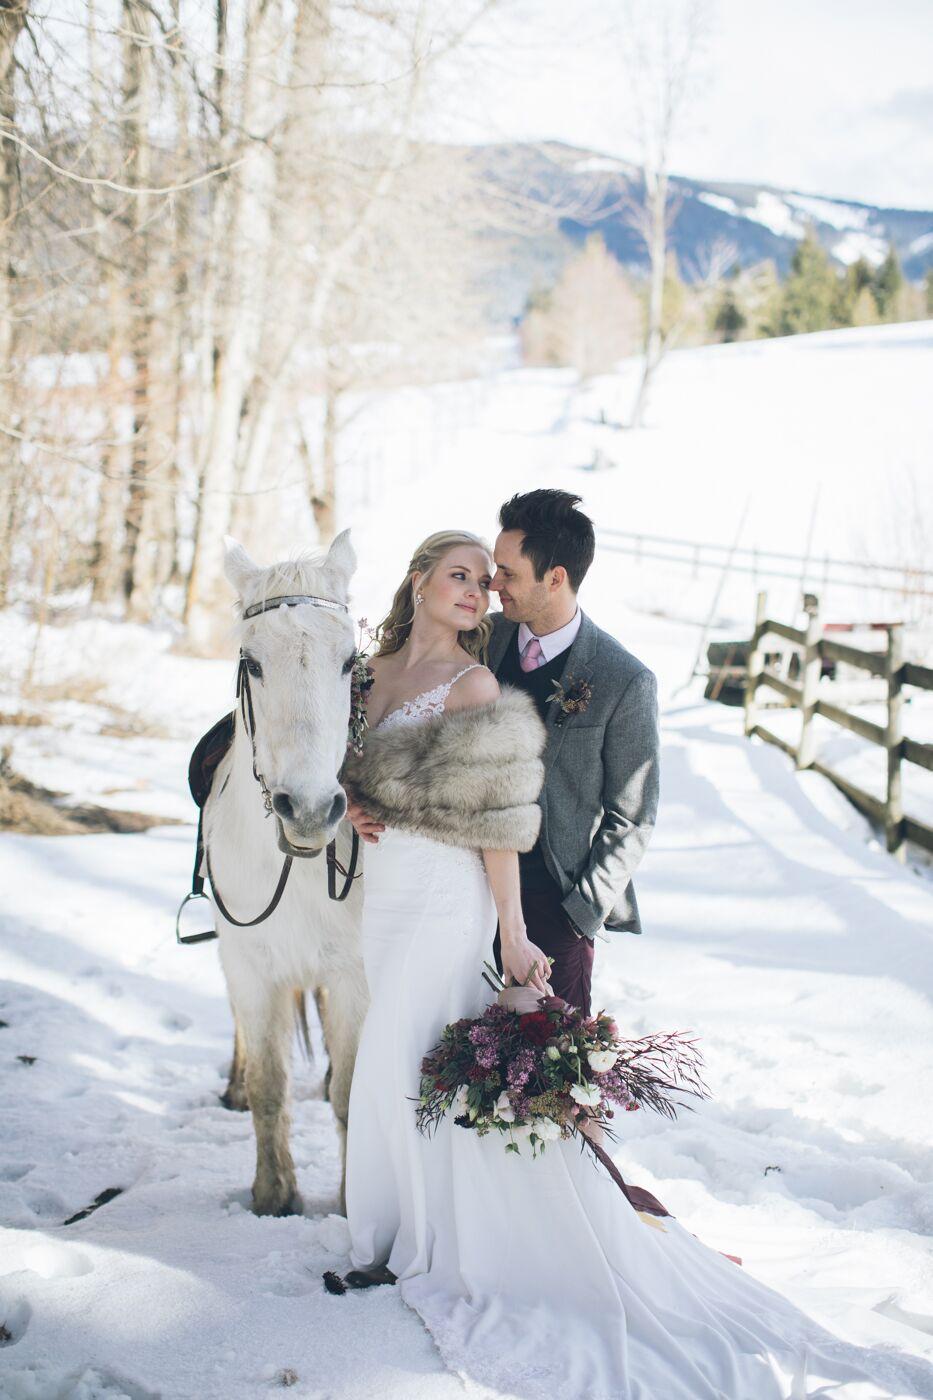 aniko-photography-mt-hood-bnb-wedding-55_preview.jpeg